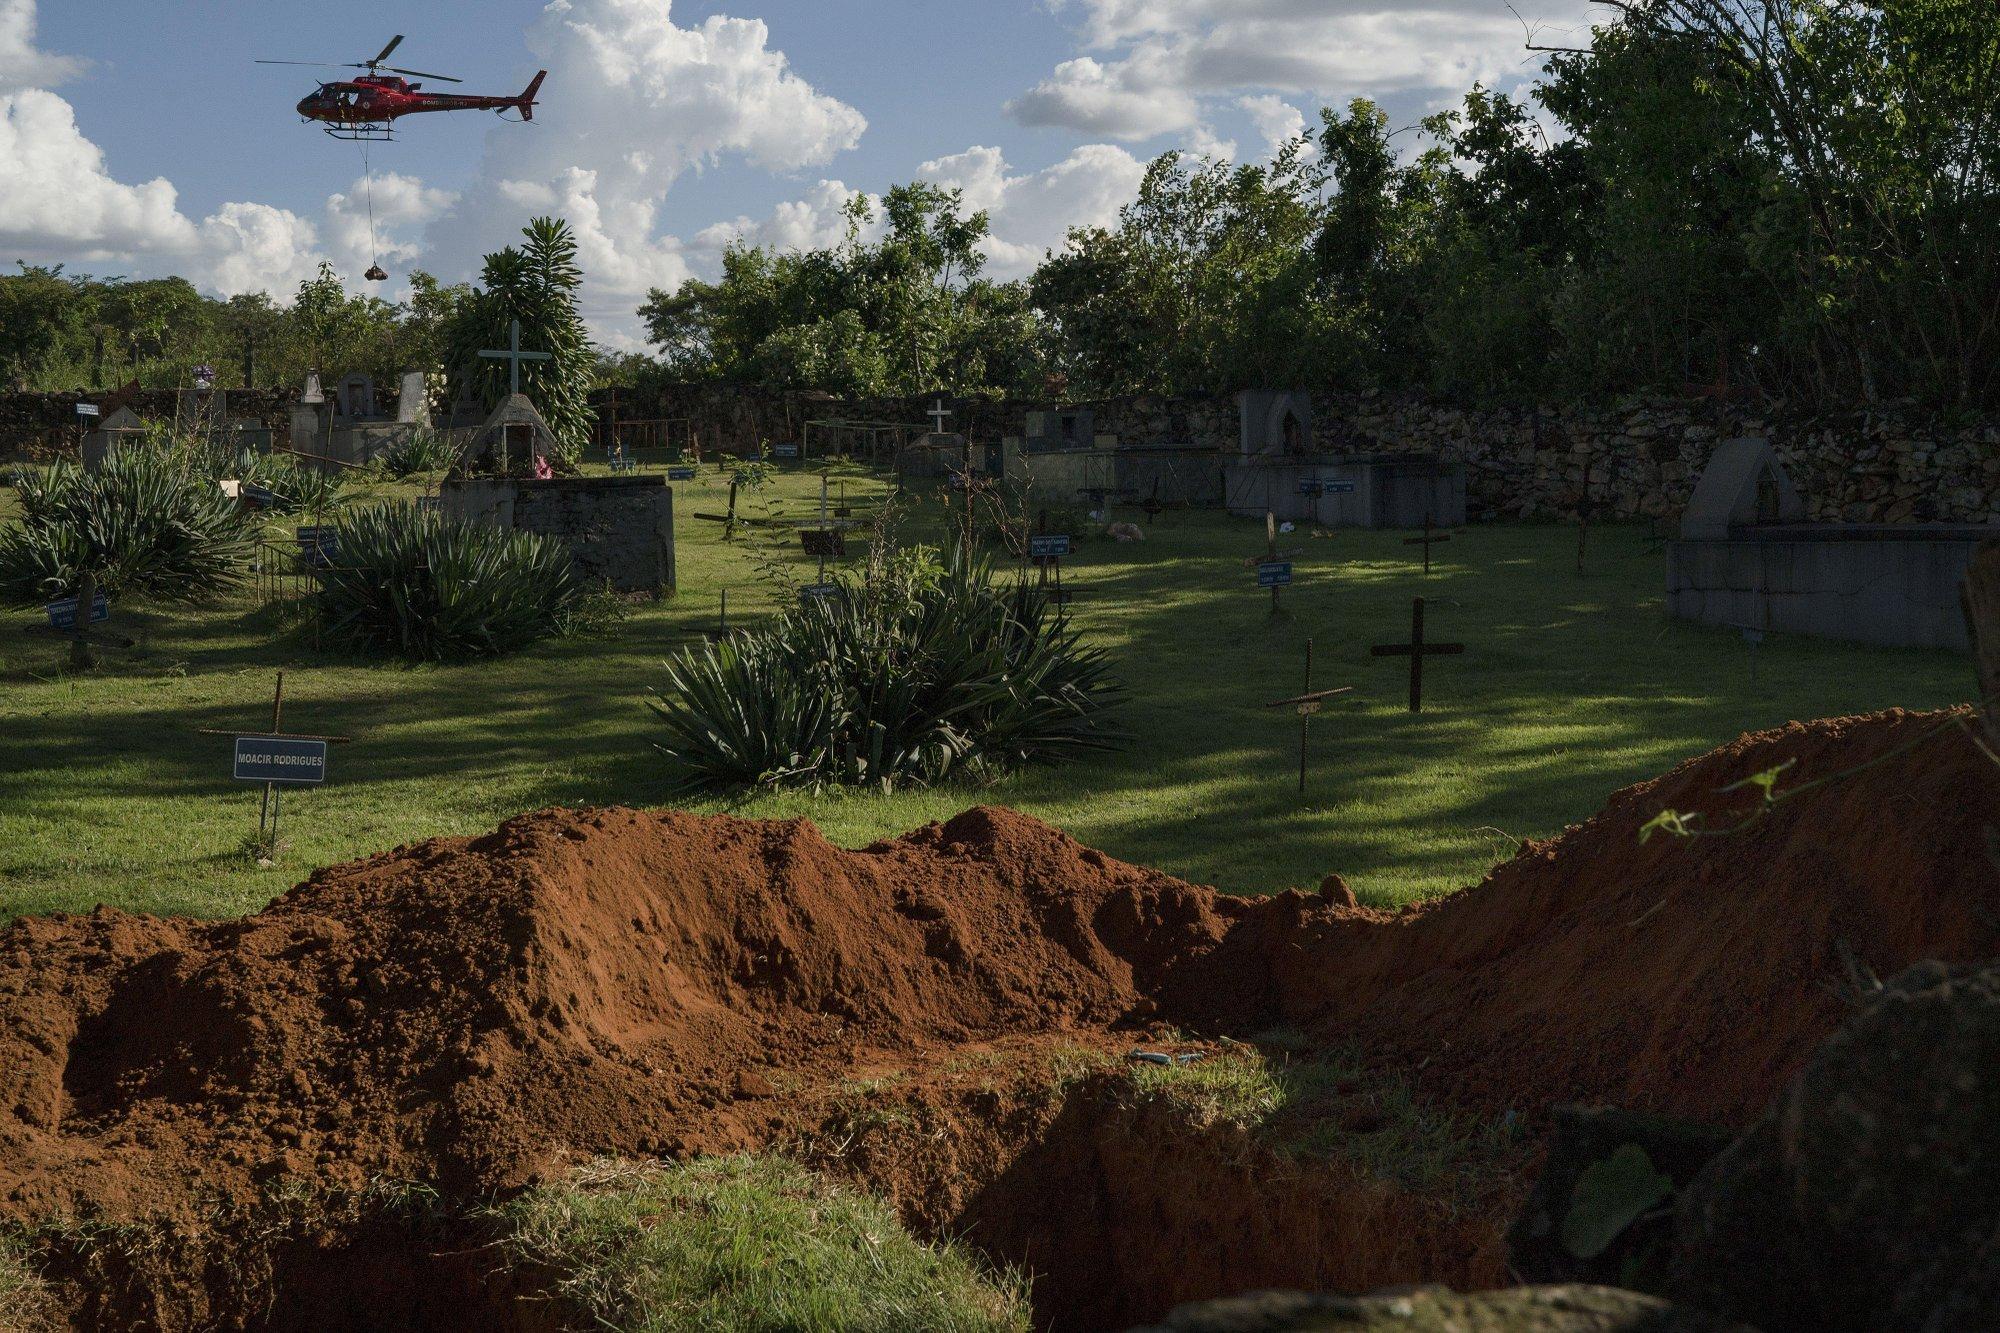 Brazil institute: Potential health crisis from dam breach